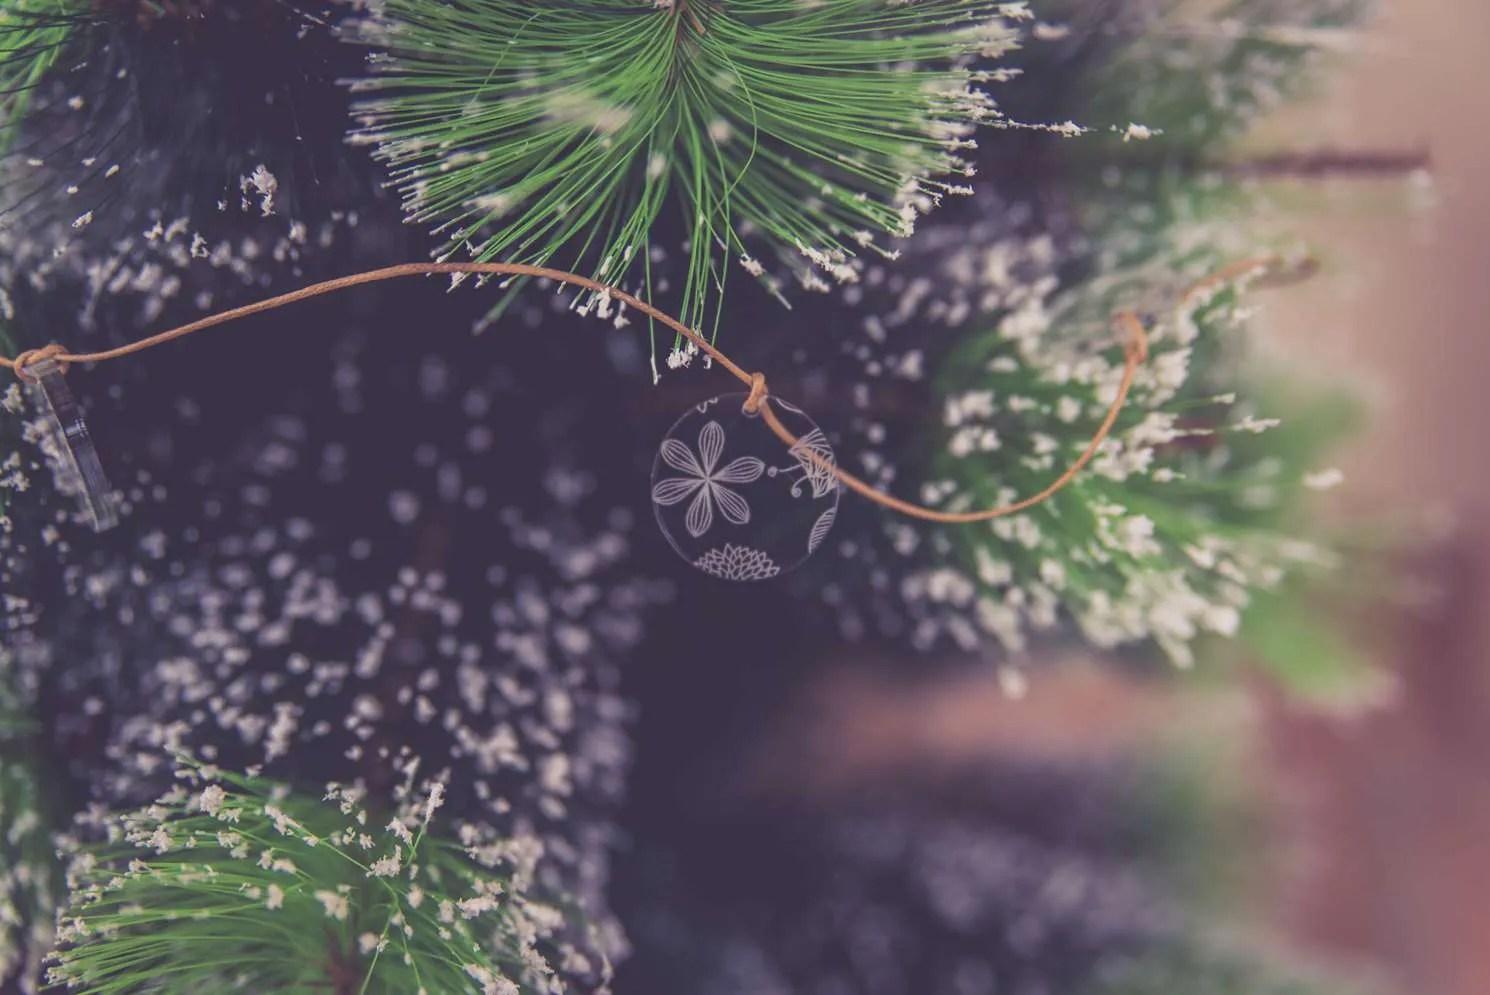 ¡¡ Llega la Navidad !!